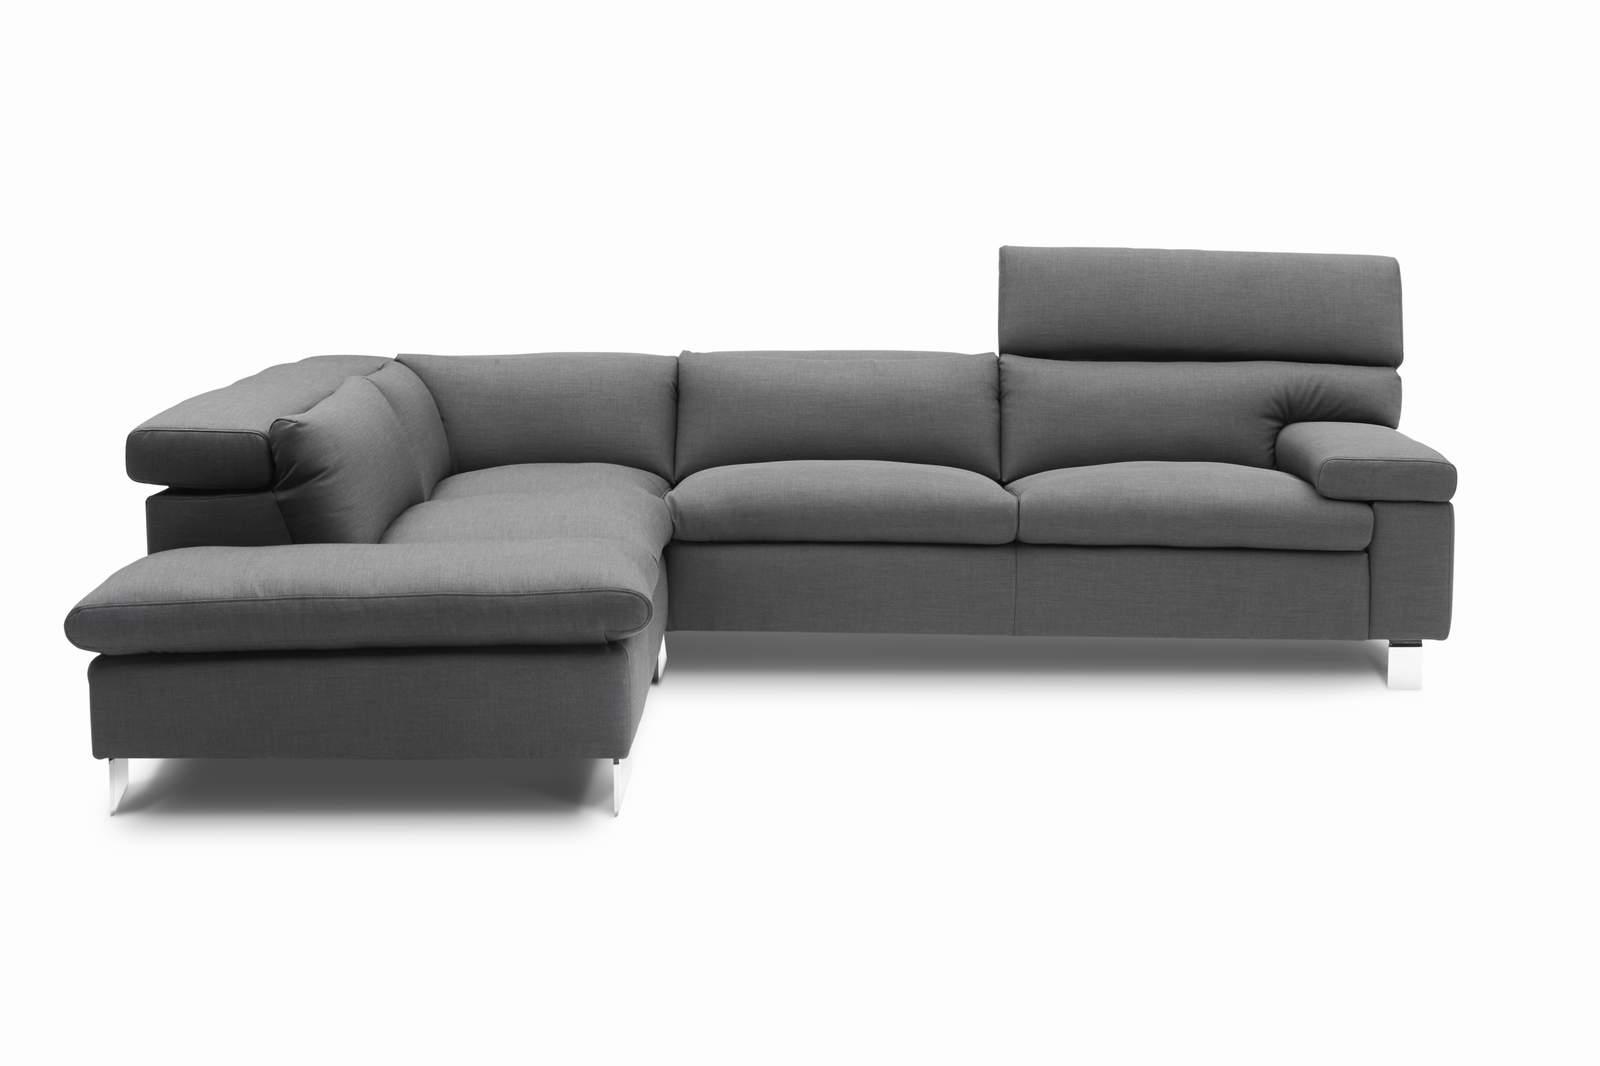 Ewald schillig sofa ewald schilling florenz with ewald for Schillig outlet